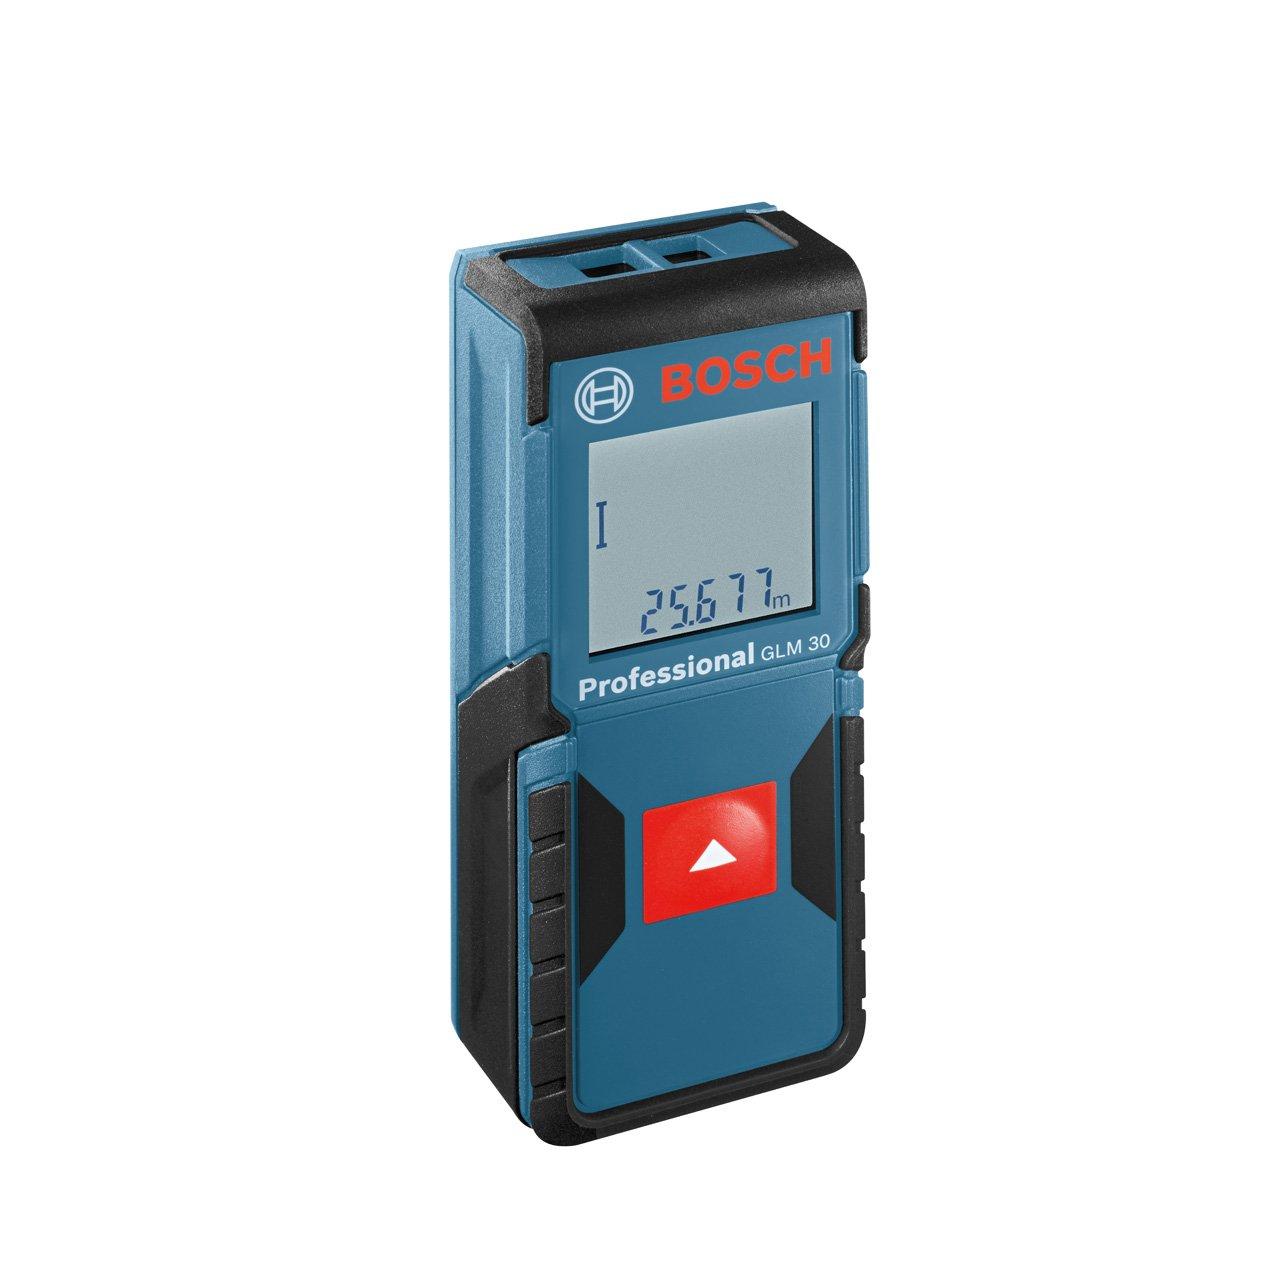 Bosch Professional Bosch Glm 30 Professional Laser Measure